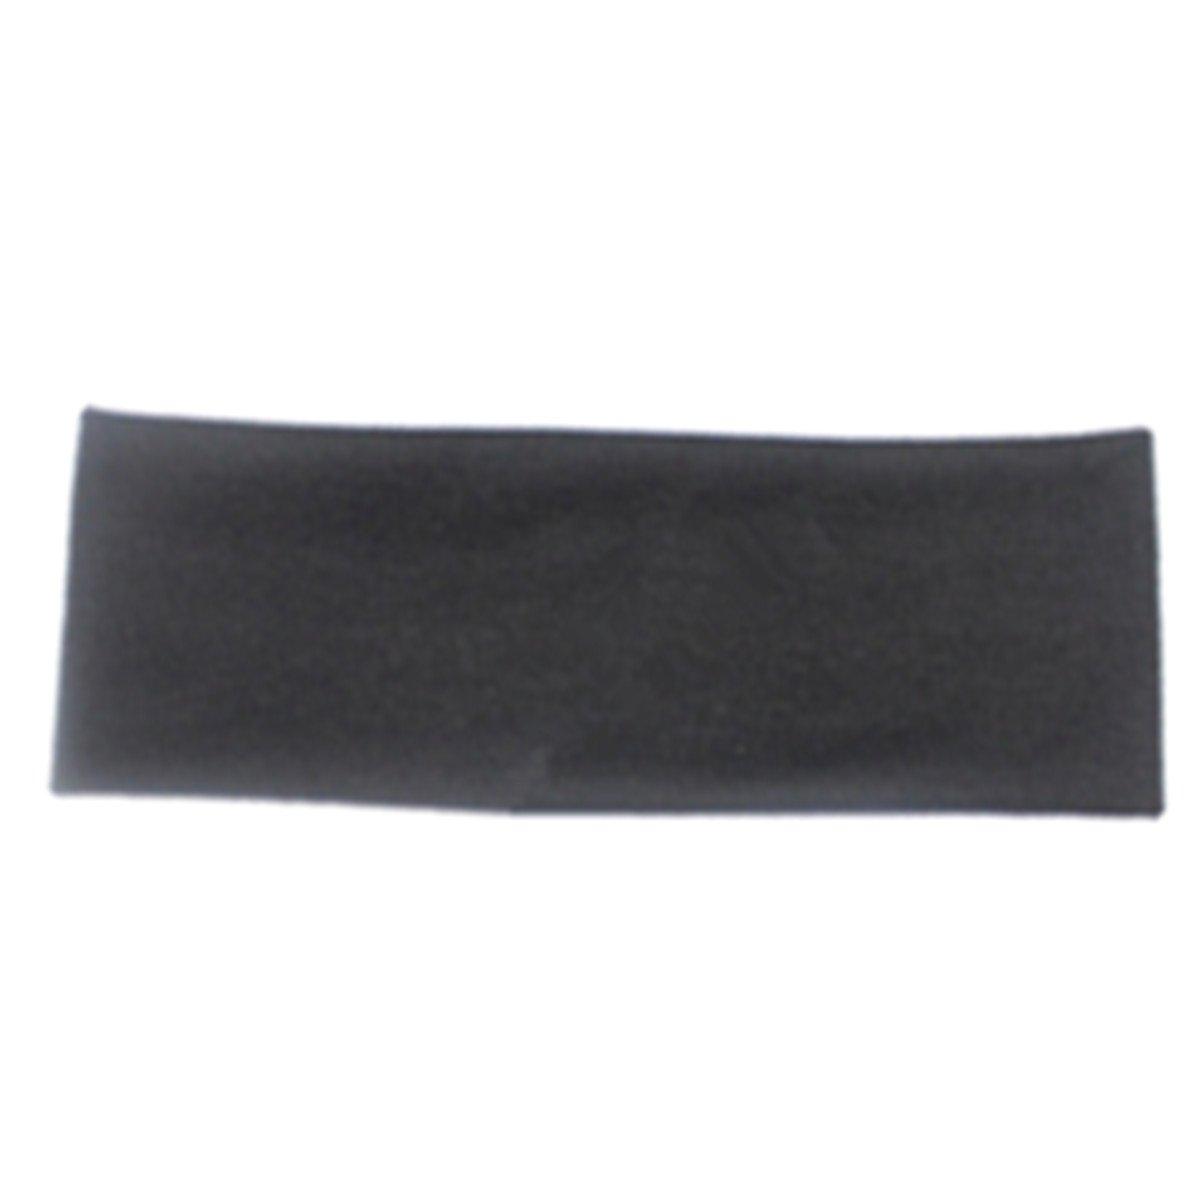 e-papayaストレッチ伸縮性ヨガスポーツソフトコットンヘアバンドカチューシャsweat-absorb B071NC3GTV ブラック ブラック